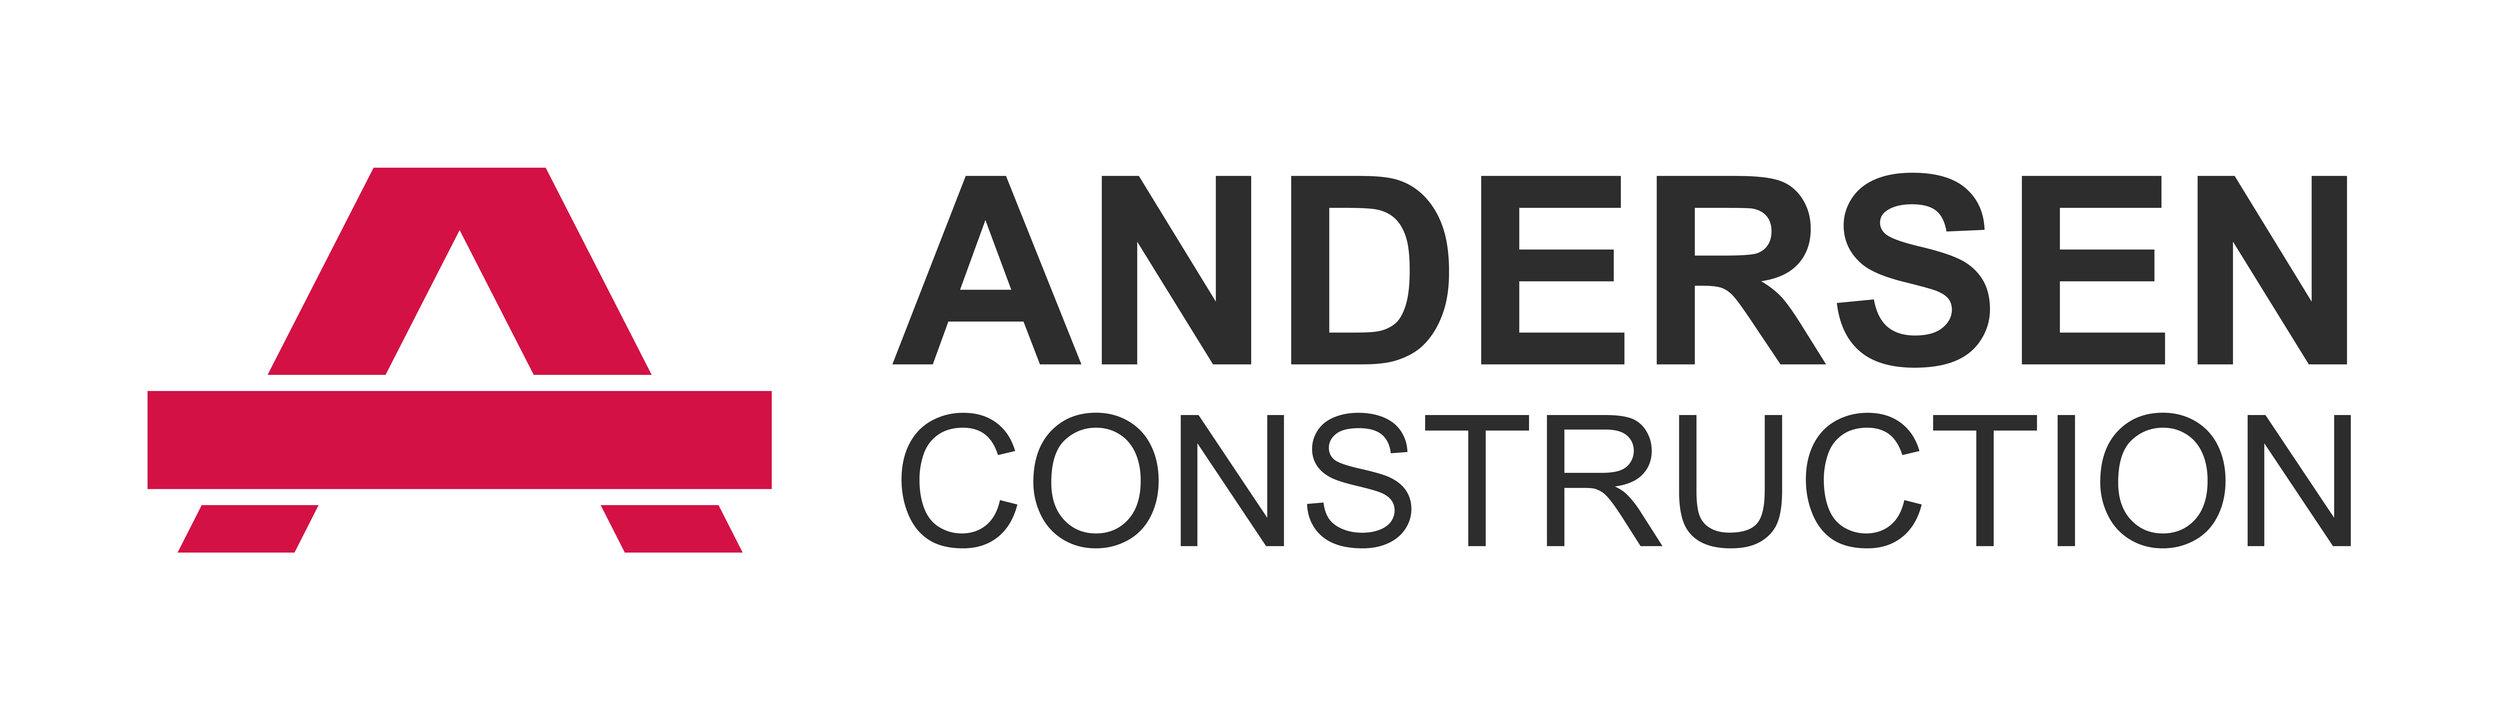 Andersen-Construction-OAME-Website-Logo-DARK.jpg